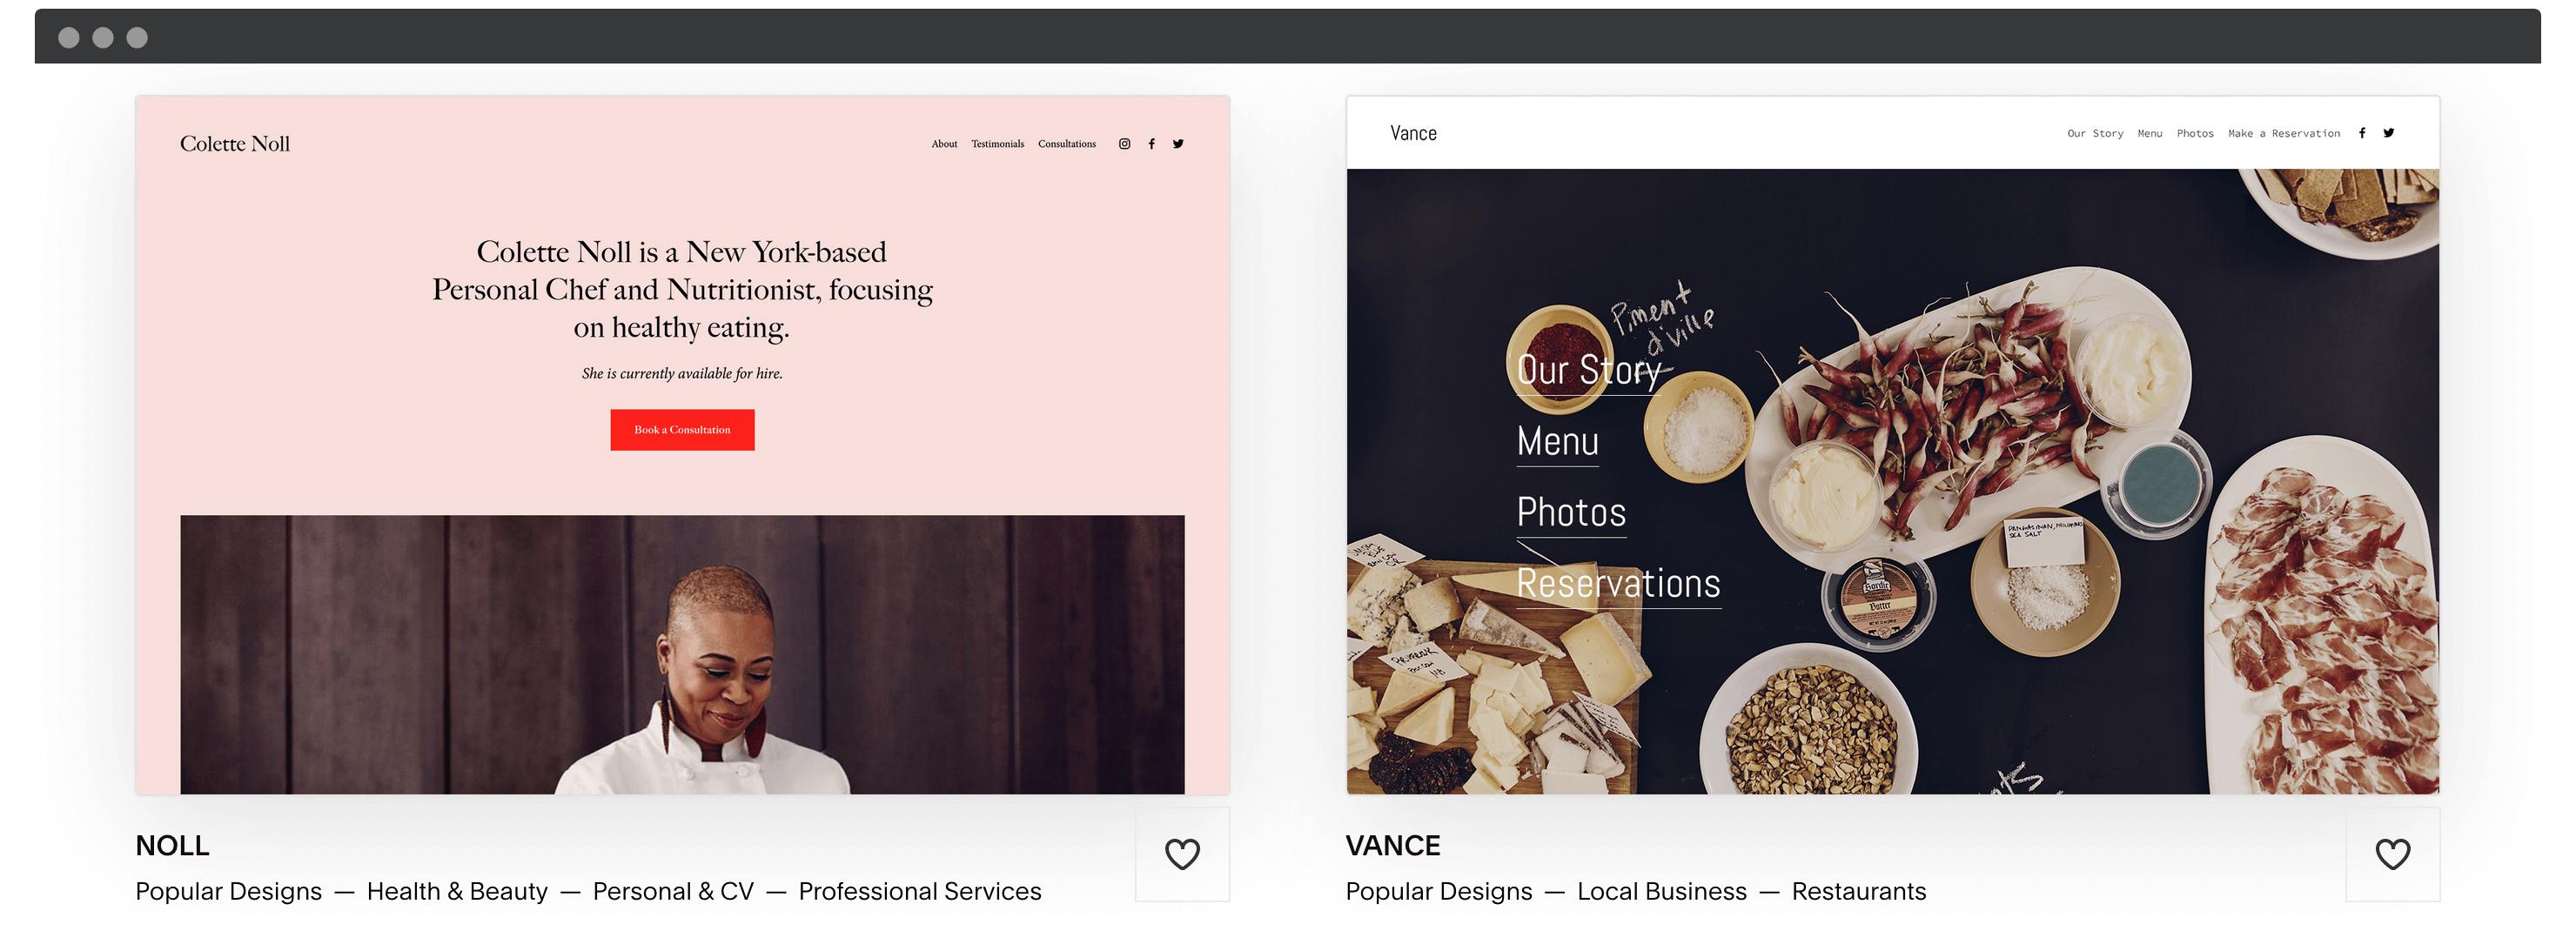 Squarespace's templates.